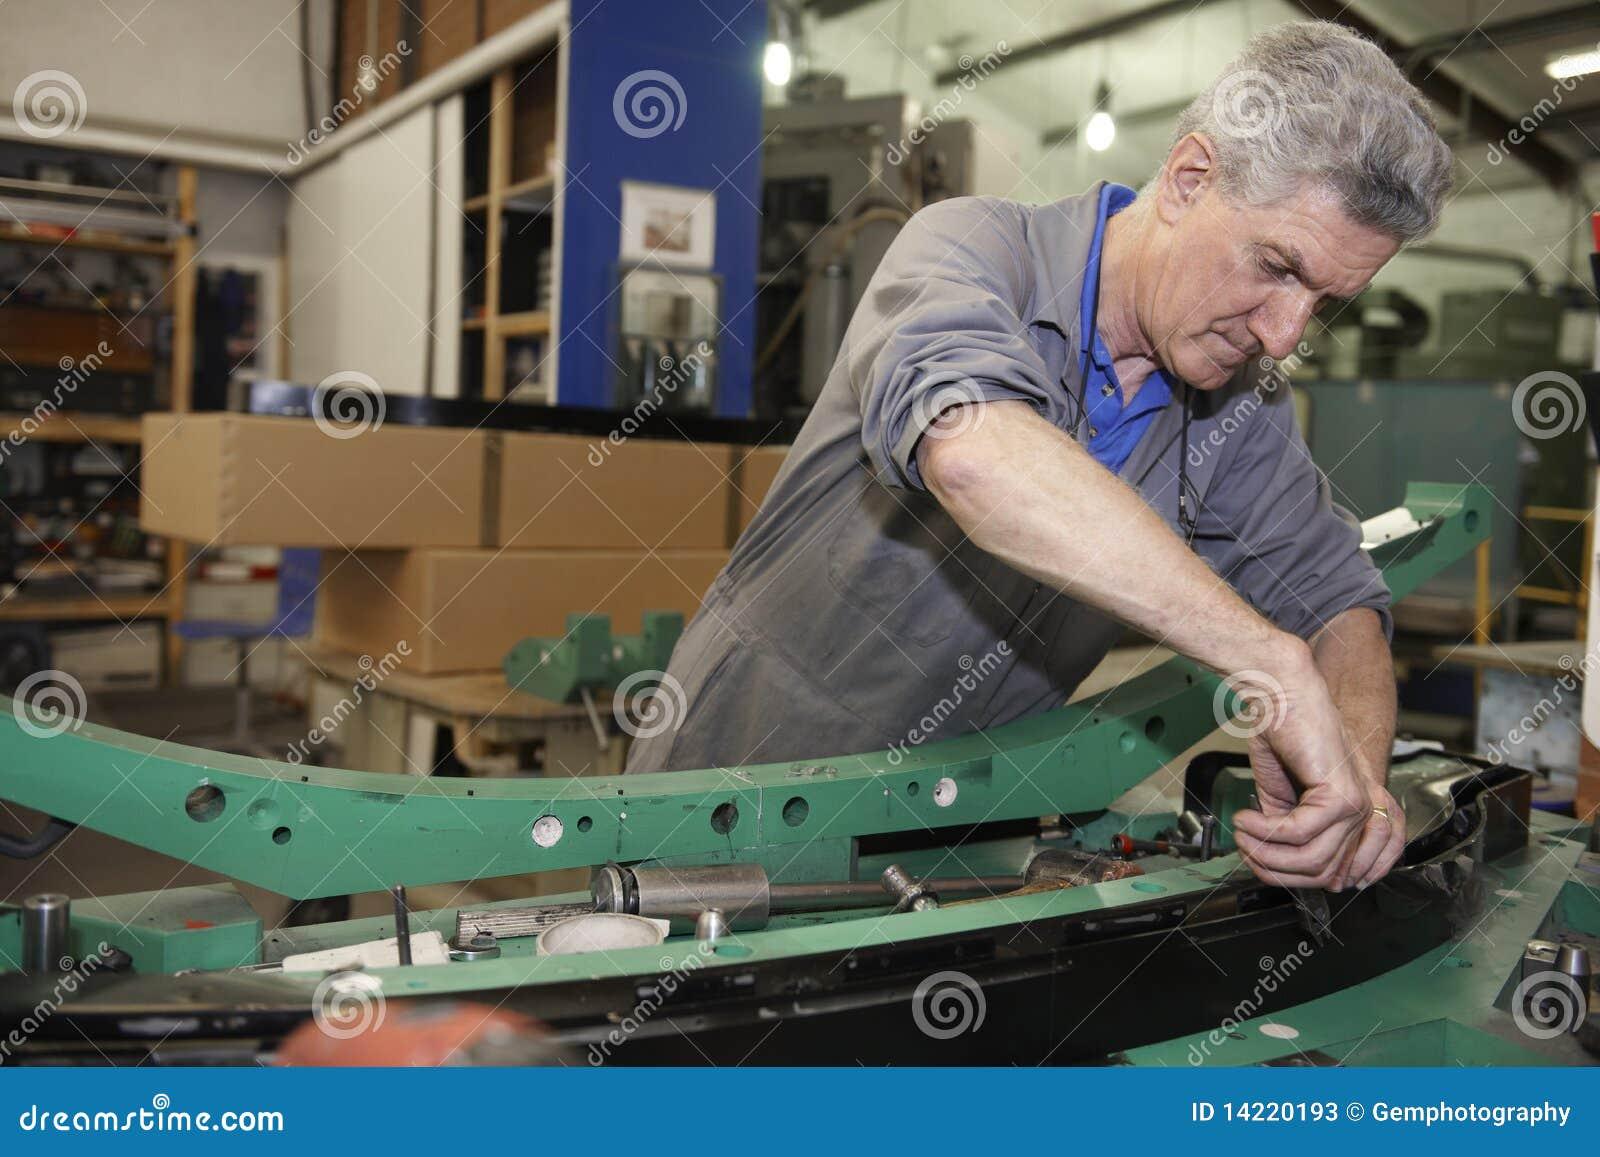 ouvrier d u0026 39  u00e9tage d u0026 39 usine image stock  image du